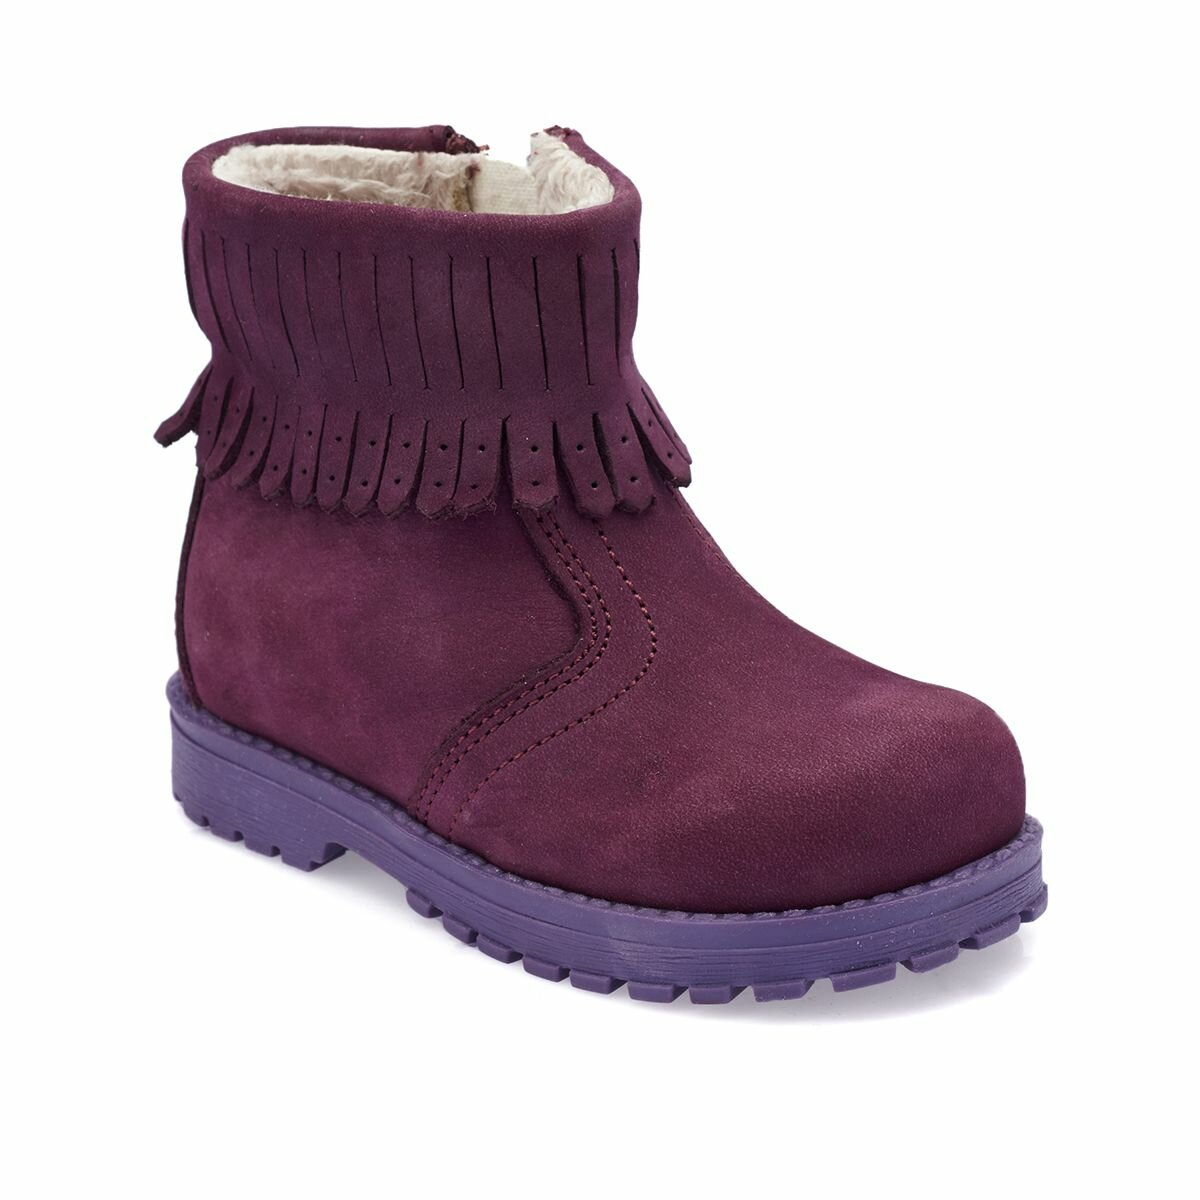 FLO 82.510776.B Purple Female Child Boots Polaris